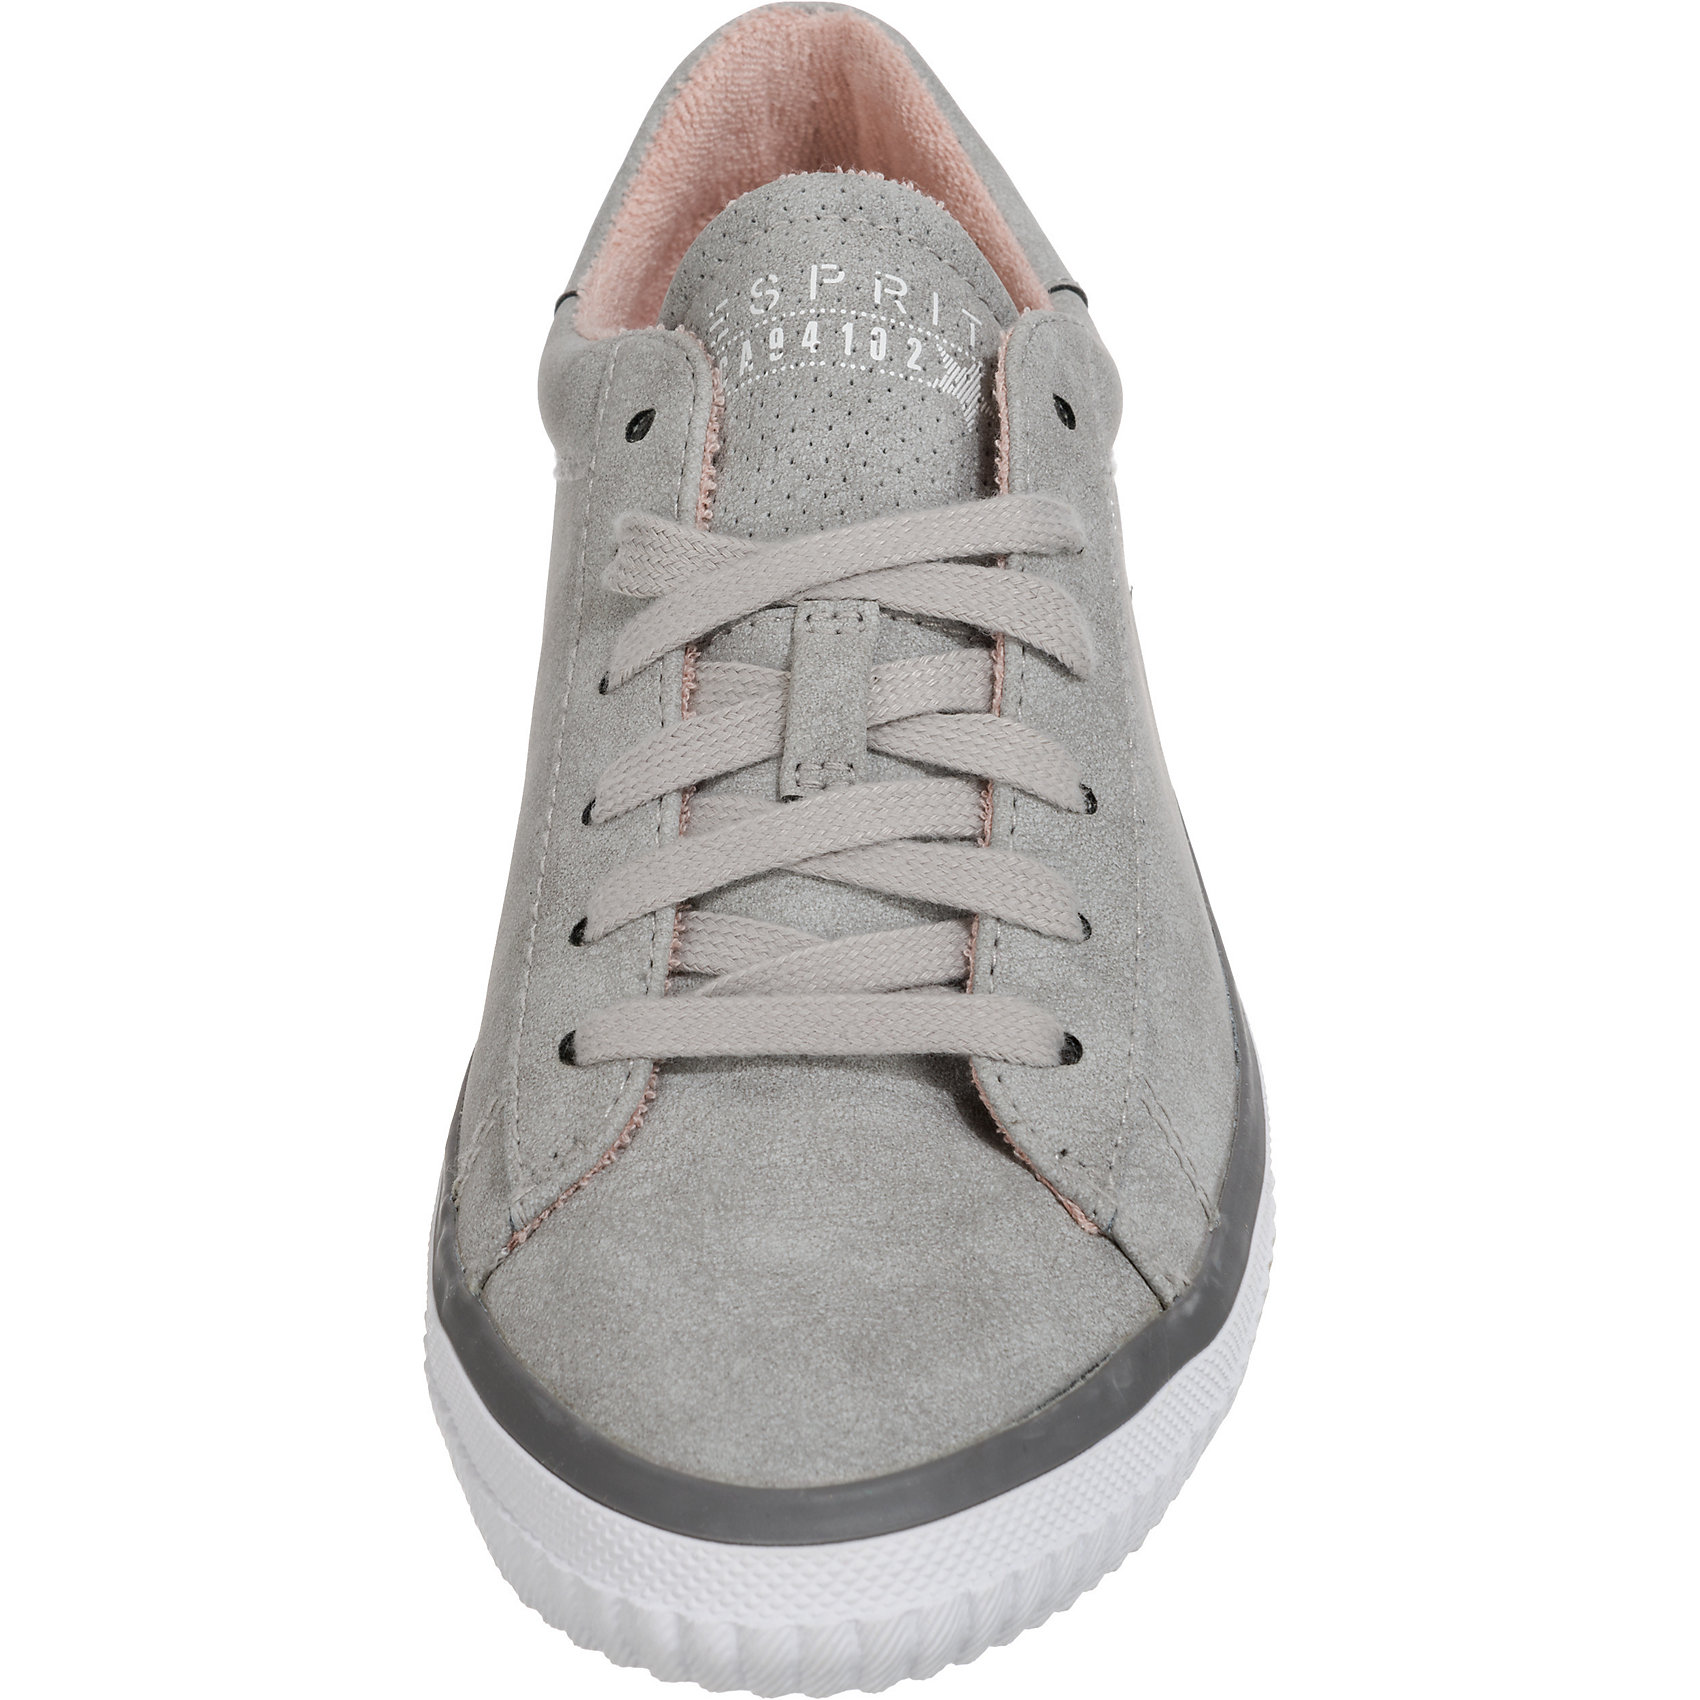 Geox D Omaya White, Schuhe, Flache Schuhe, Straßenschuhe, Weiß, Female, 36